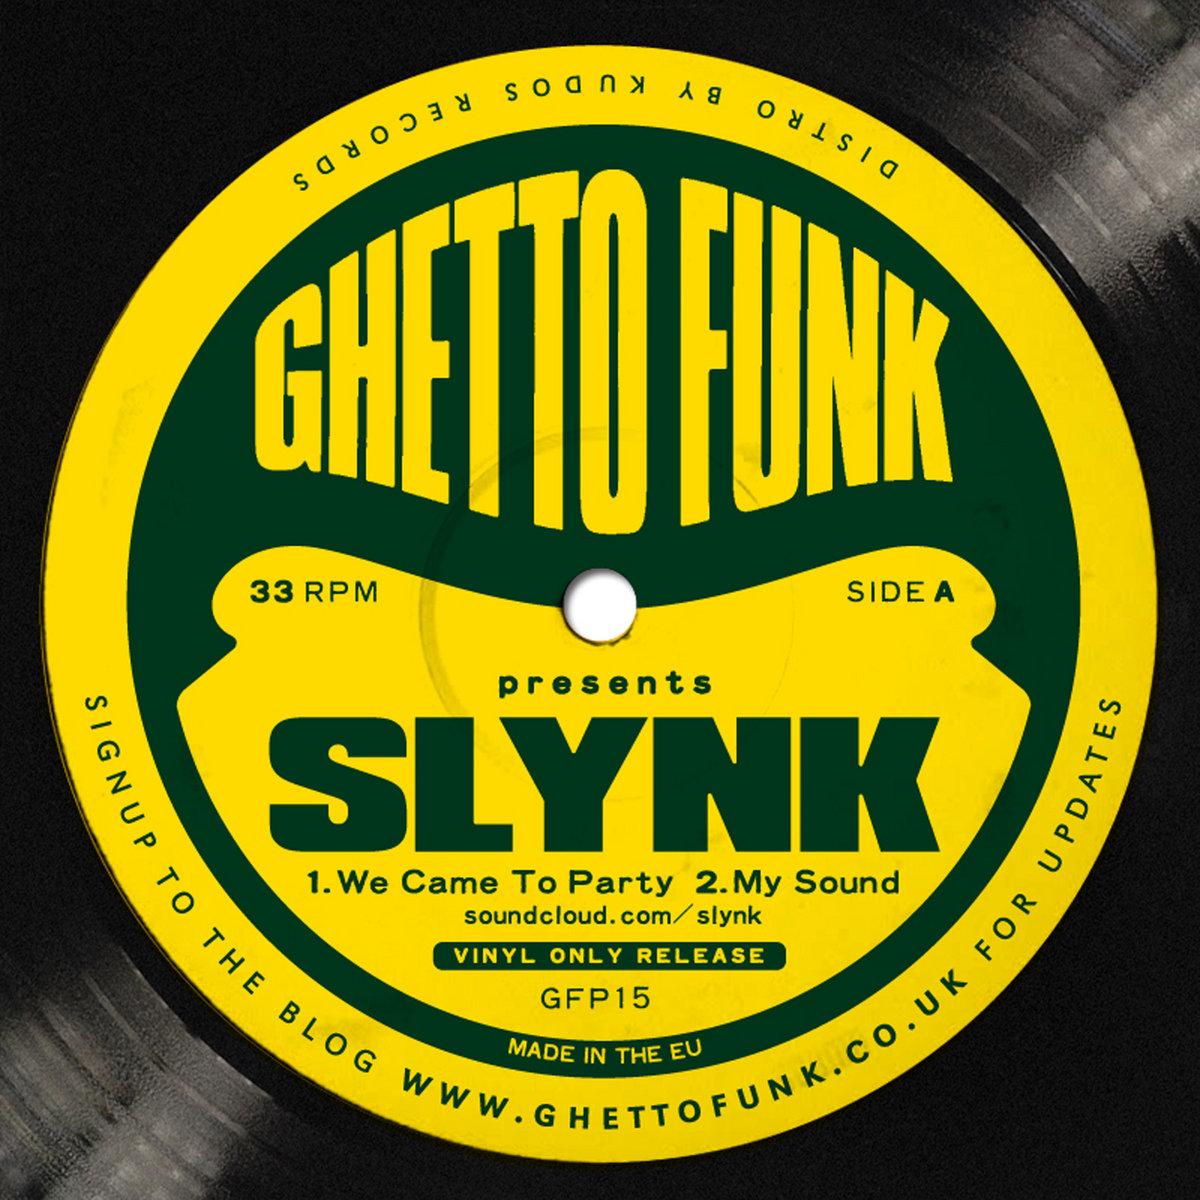 Slynk - Dancefloor Silly | Ghetto Funk